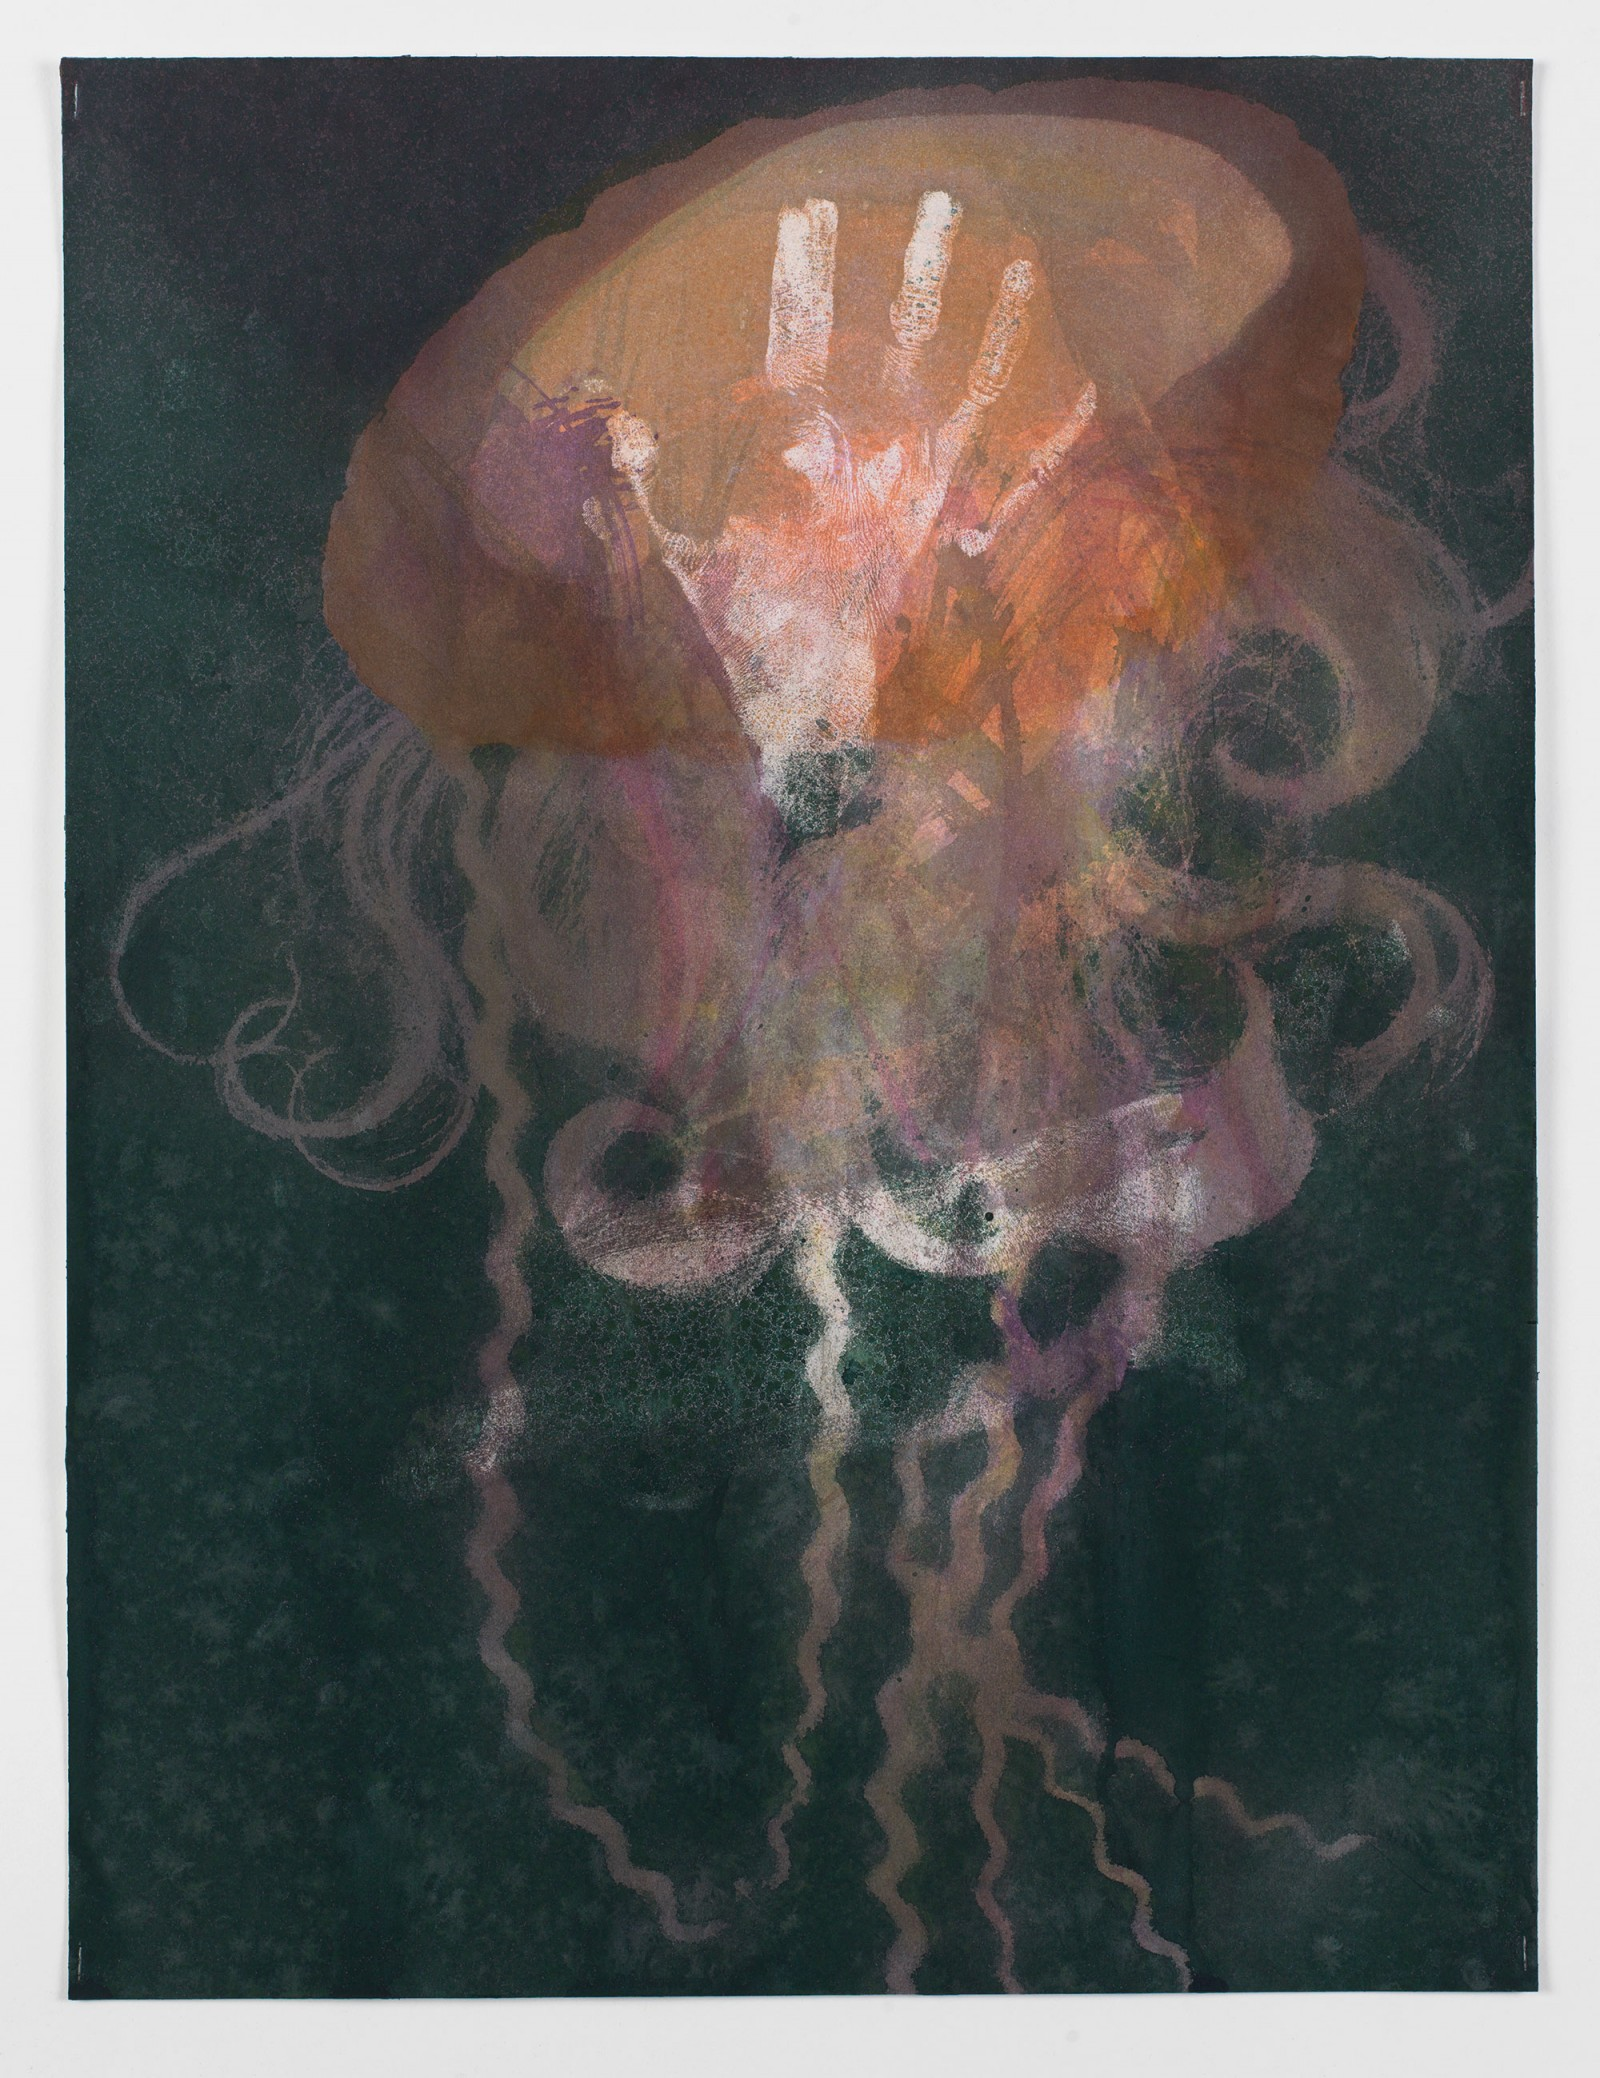 Kim Nekarda: untitled, 2015, body print, watercolour & vinyl color on paper, 61 x 46 cm